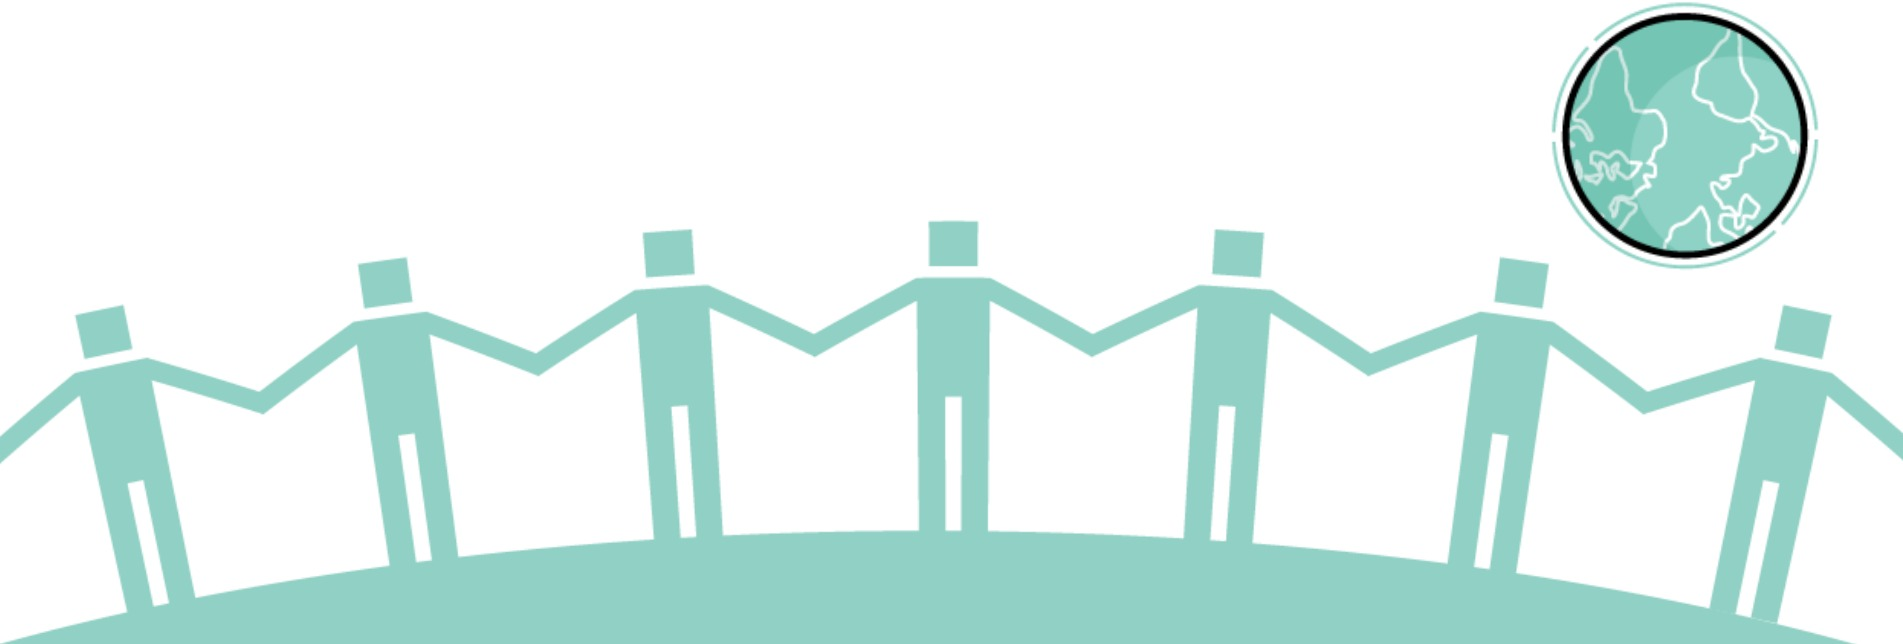 LIBRO-EPIC Social Impact Initiative